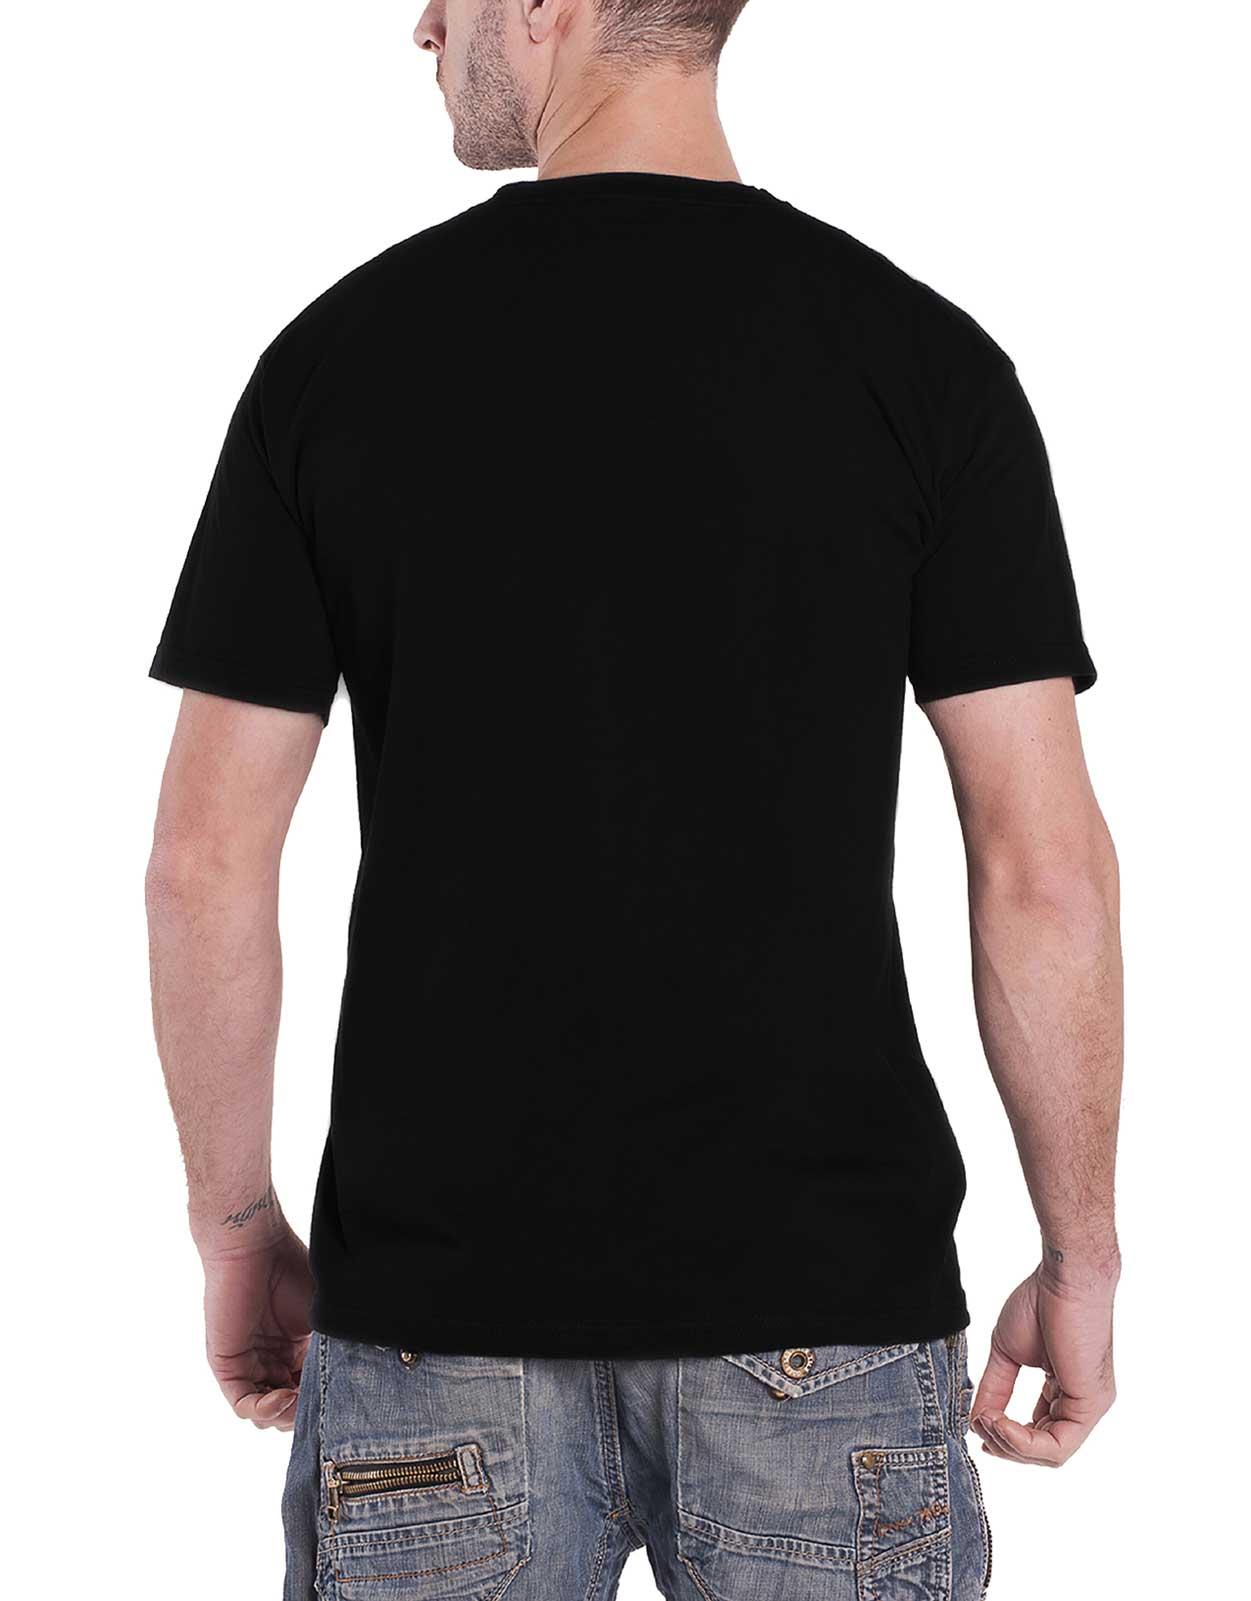 Officiel-Jimi-Hendrix-T-Shirt-Purple-Haze-Are-you-experienced-Logo-Homme-NEUF miniature 33